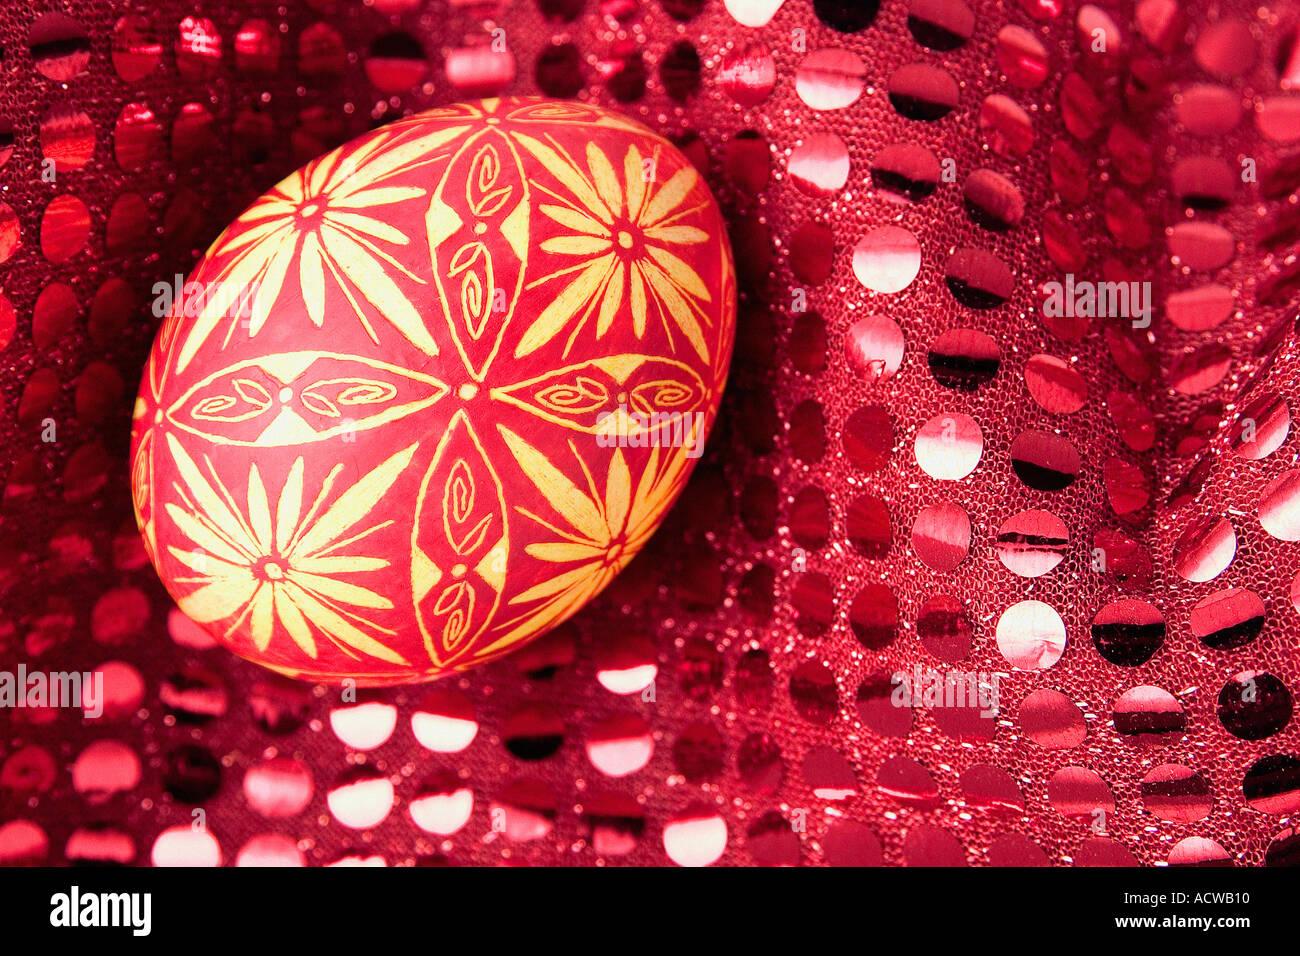 Huevo de pascua de entramado Foto de stock